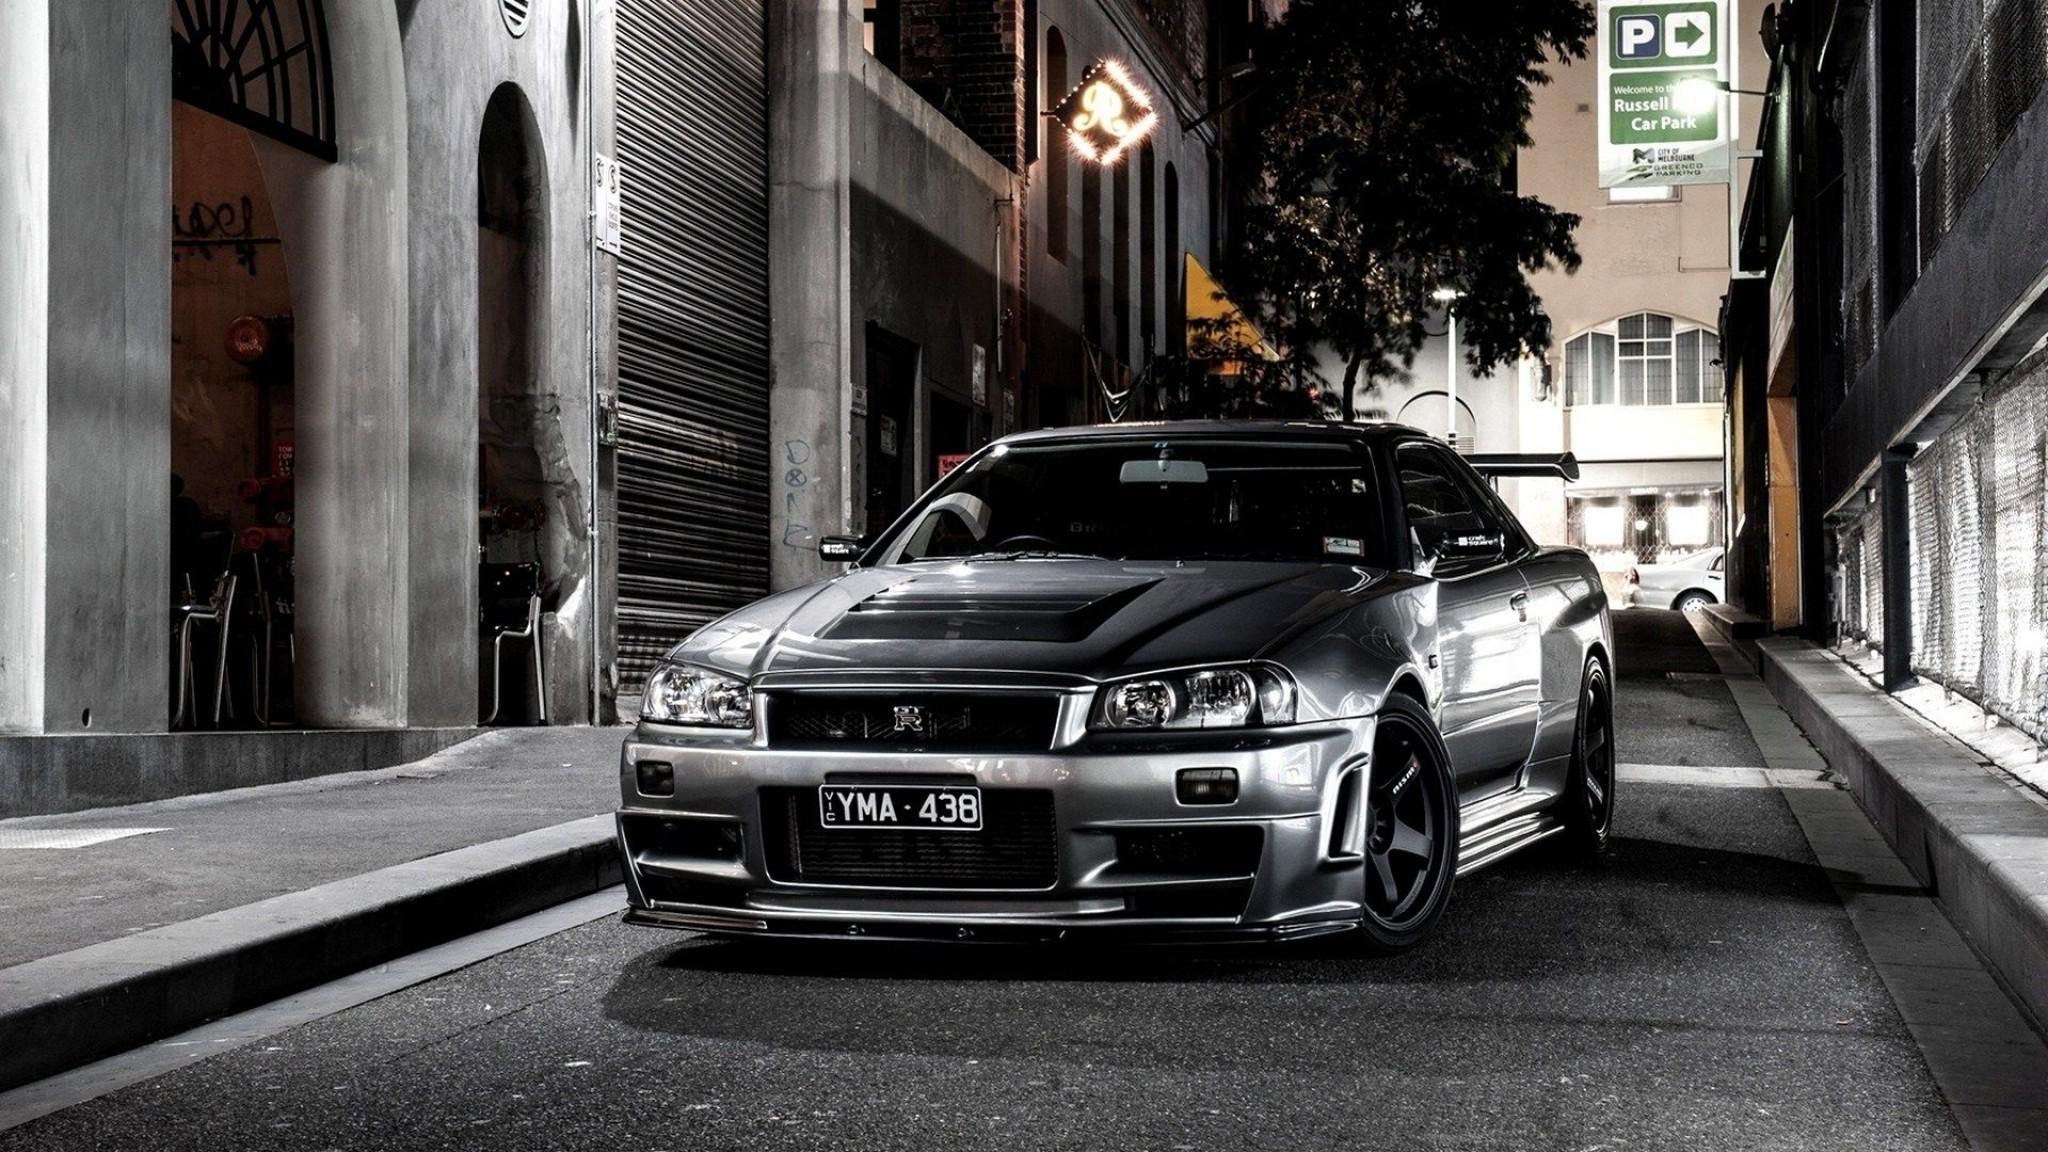 1920x1080 Nissan Skyline Gtr R34 #nissan #jdm #japan | Motoryzacja /  Automotive | Pinterest | Skyline Gtr R34, Gtr R34 And Skyline GTR